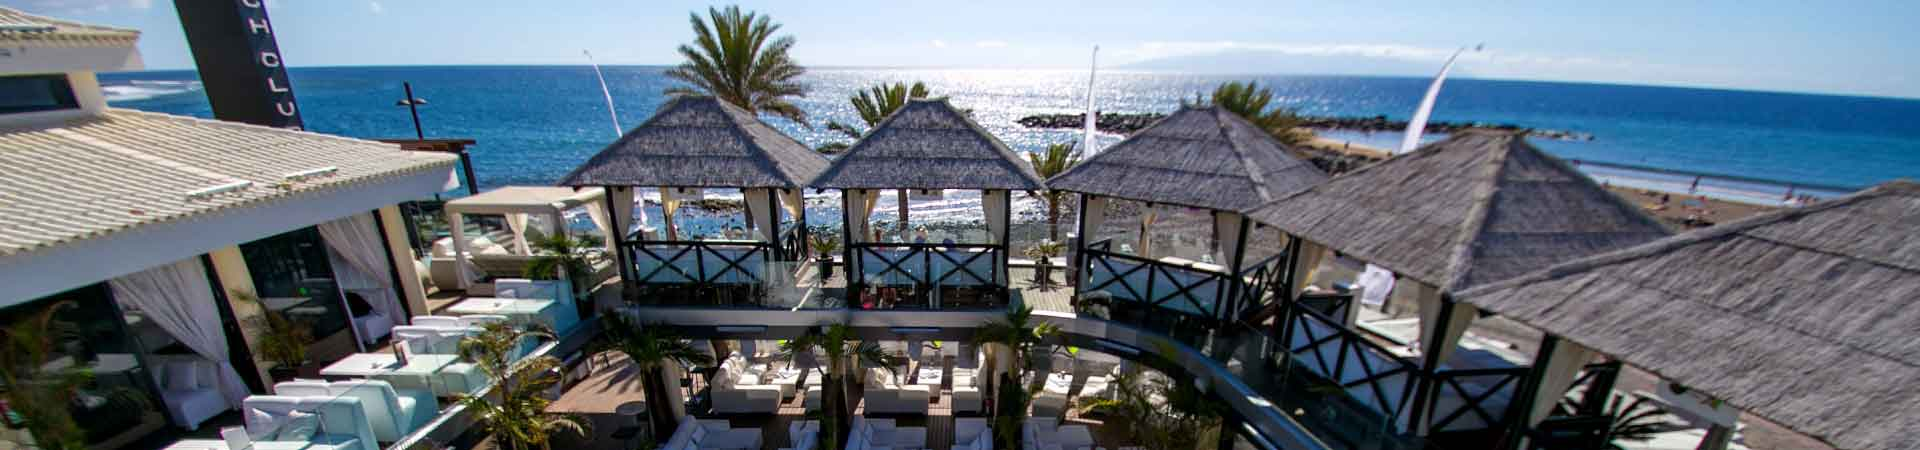 https://www.goodmorningtenerife.com/wp-content/uploads/2015/07/03_slide_papagayo-beach-club-1920x450-1.jpg